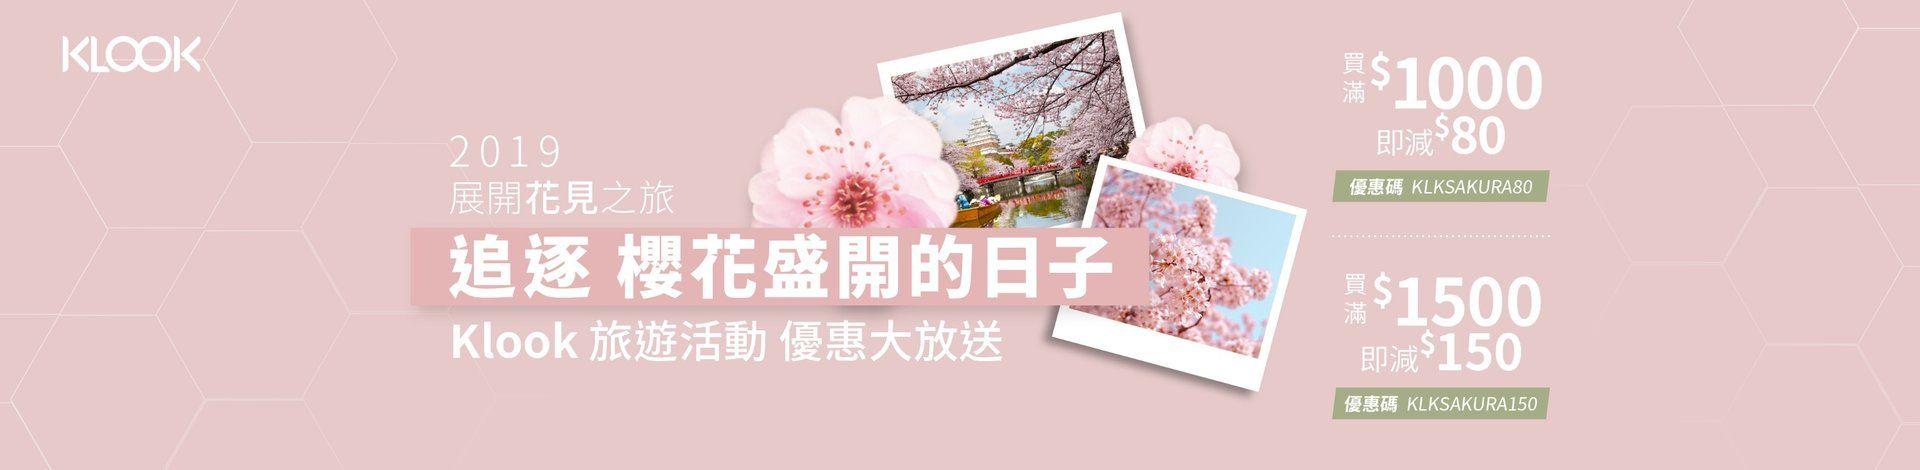 T S Sakura Time Hkd150 Off Activities Tours Promo Codes Coding Book Activities